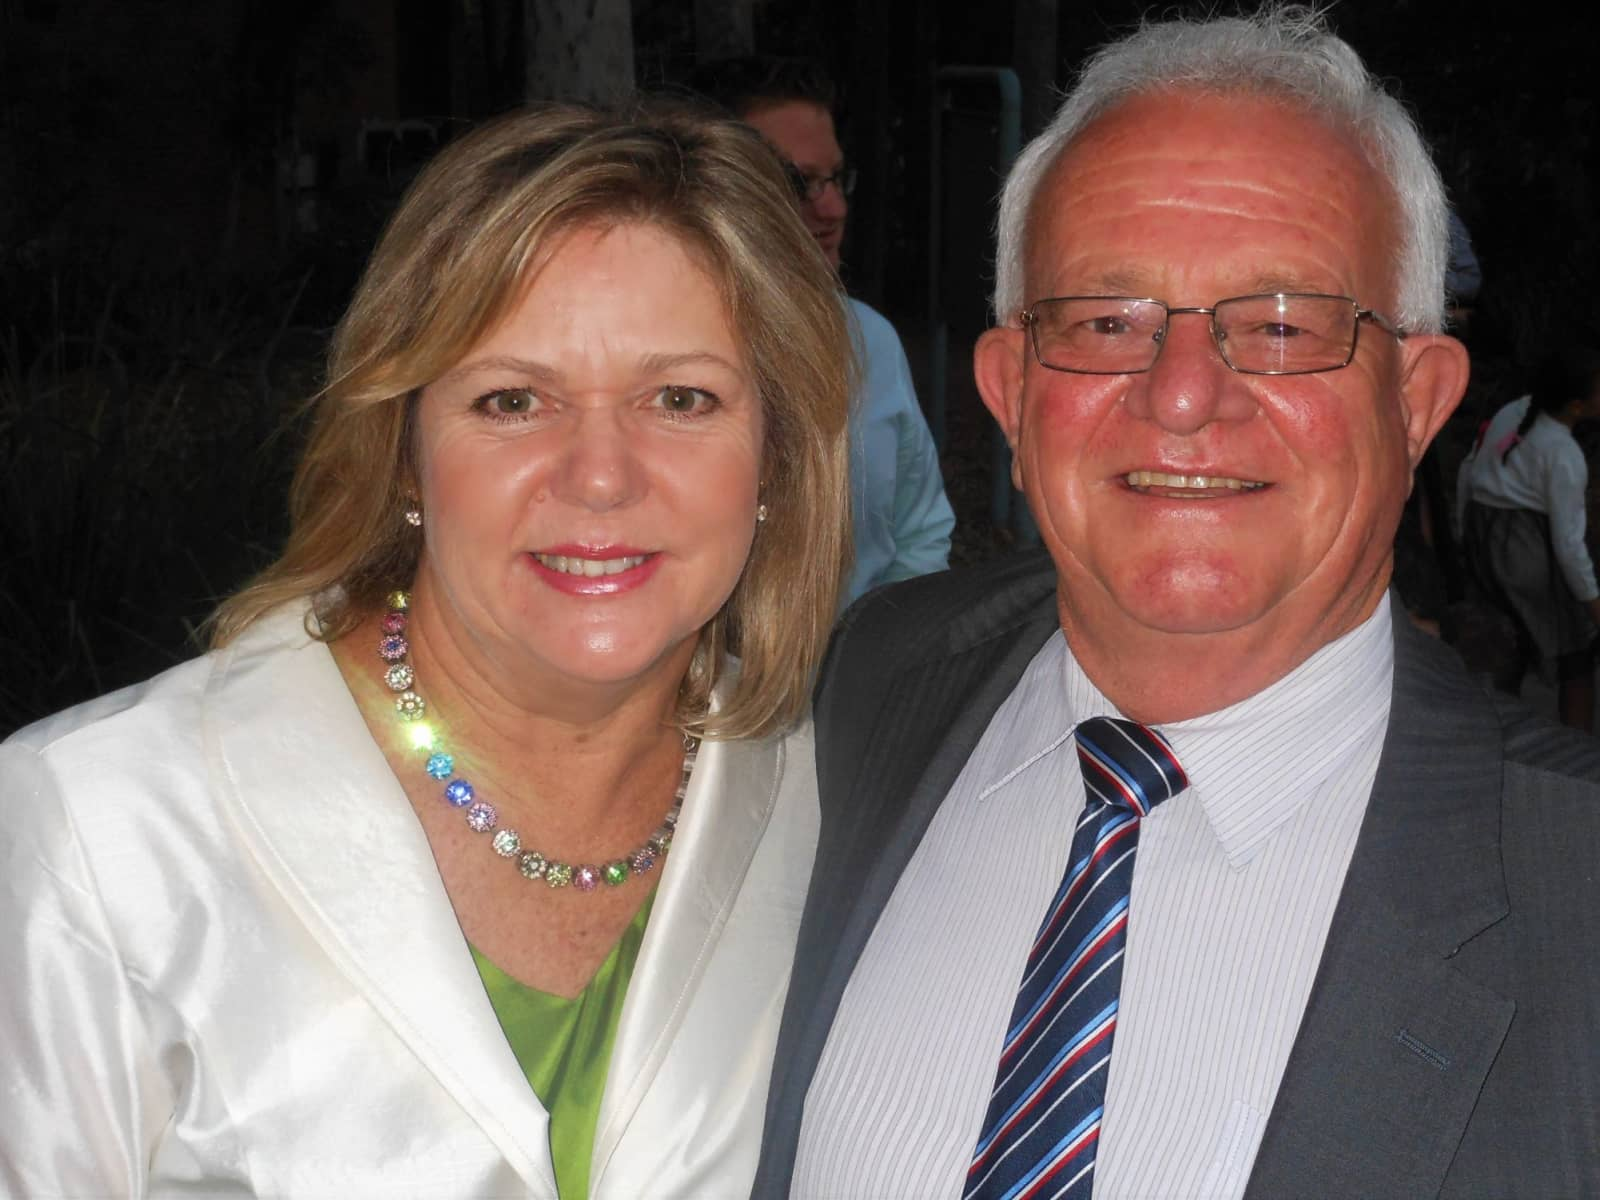 Gordon & Jennifer from Port Macquarie, New South Wales, Australia